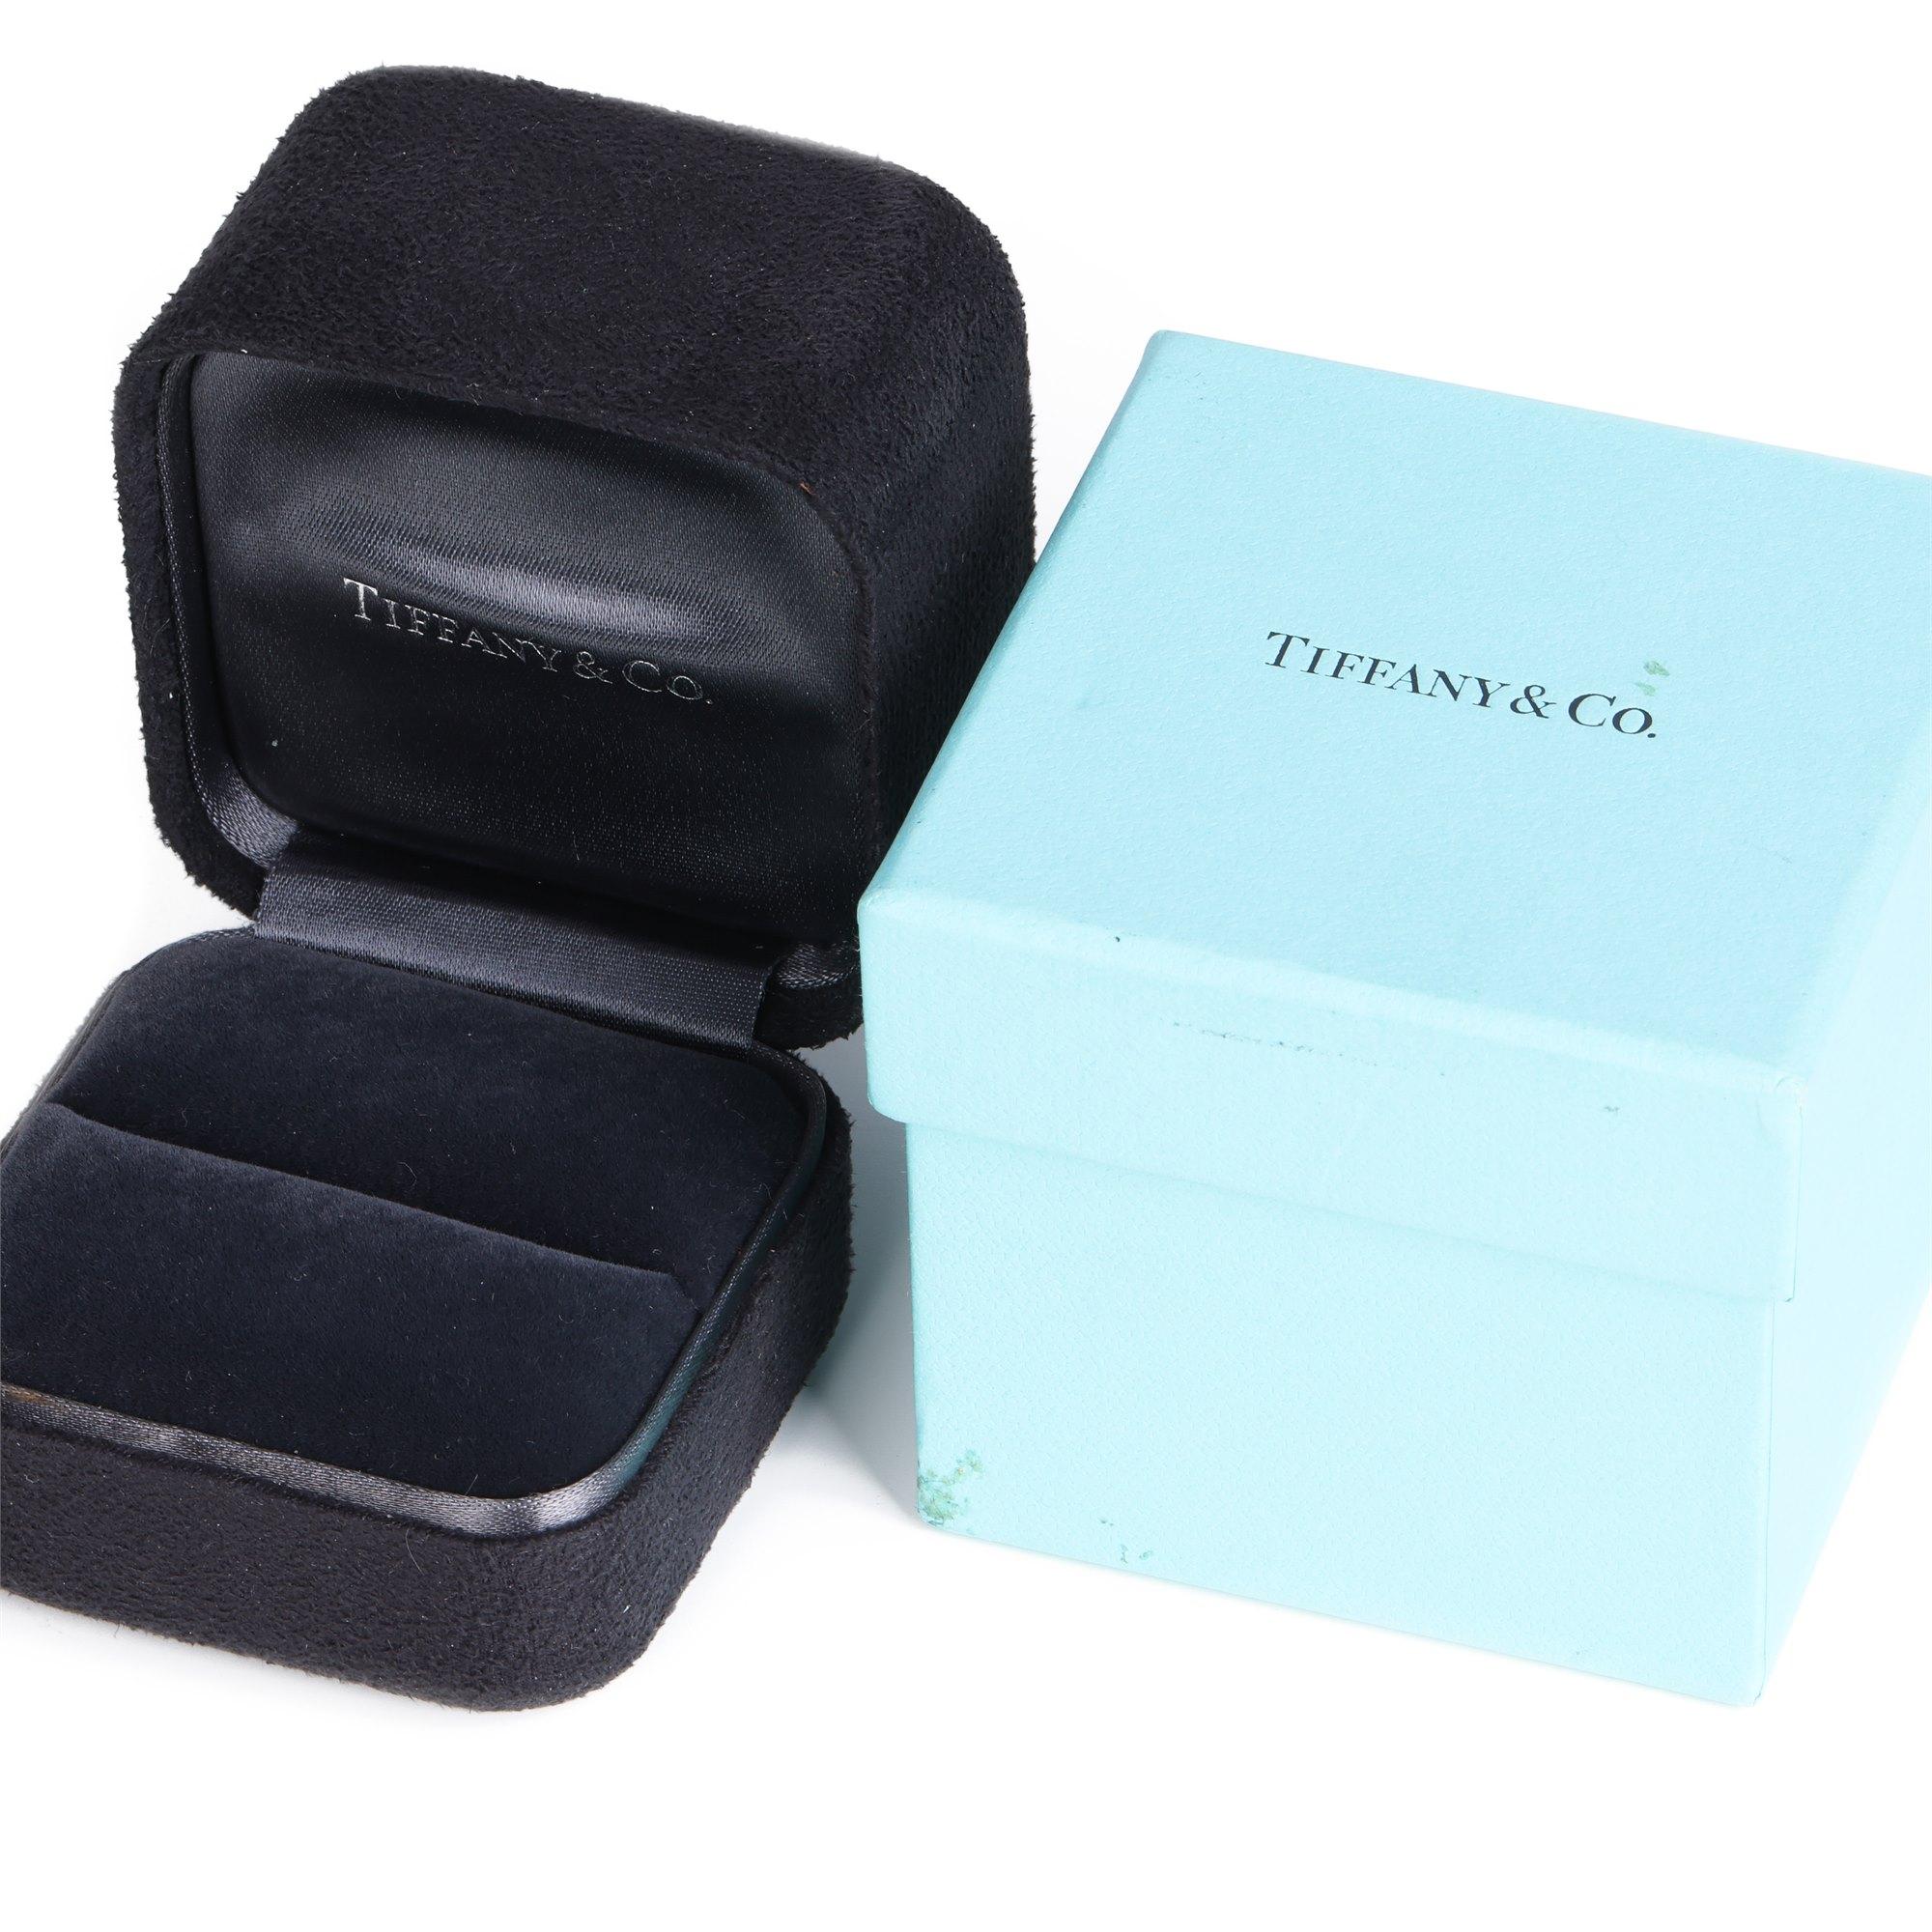 Tiffany & Co. 18ct White Gold Paloma Picasso 0.19ct Diamond Ring